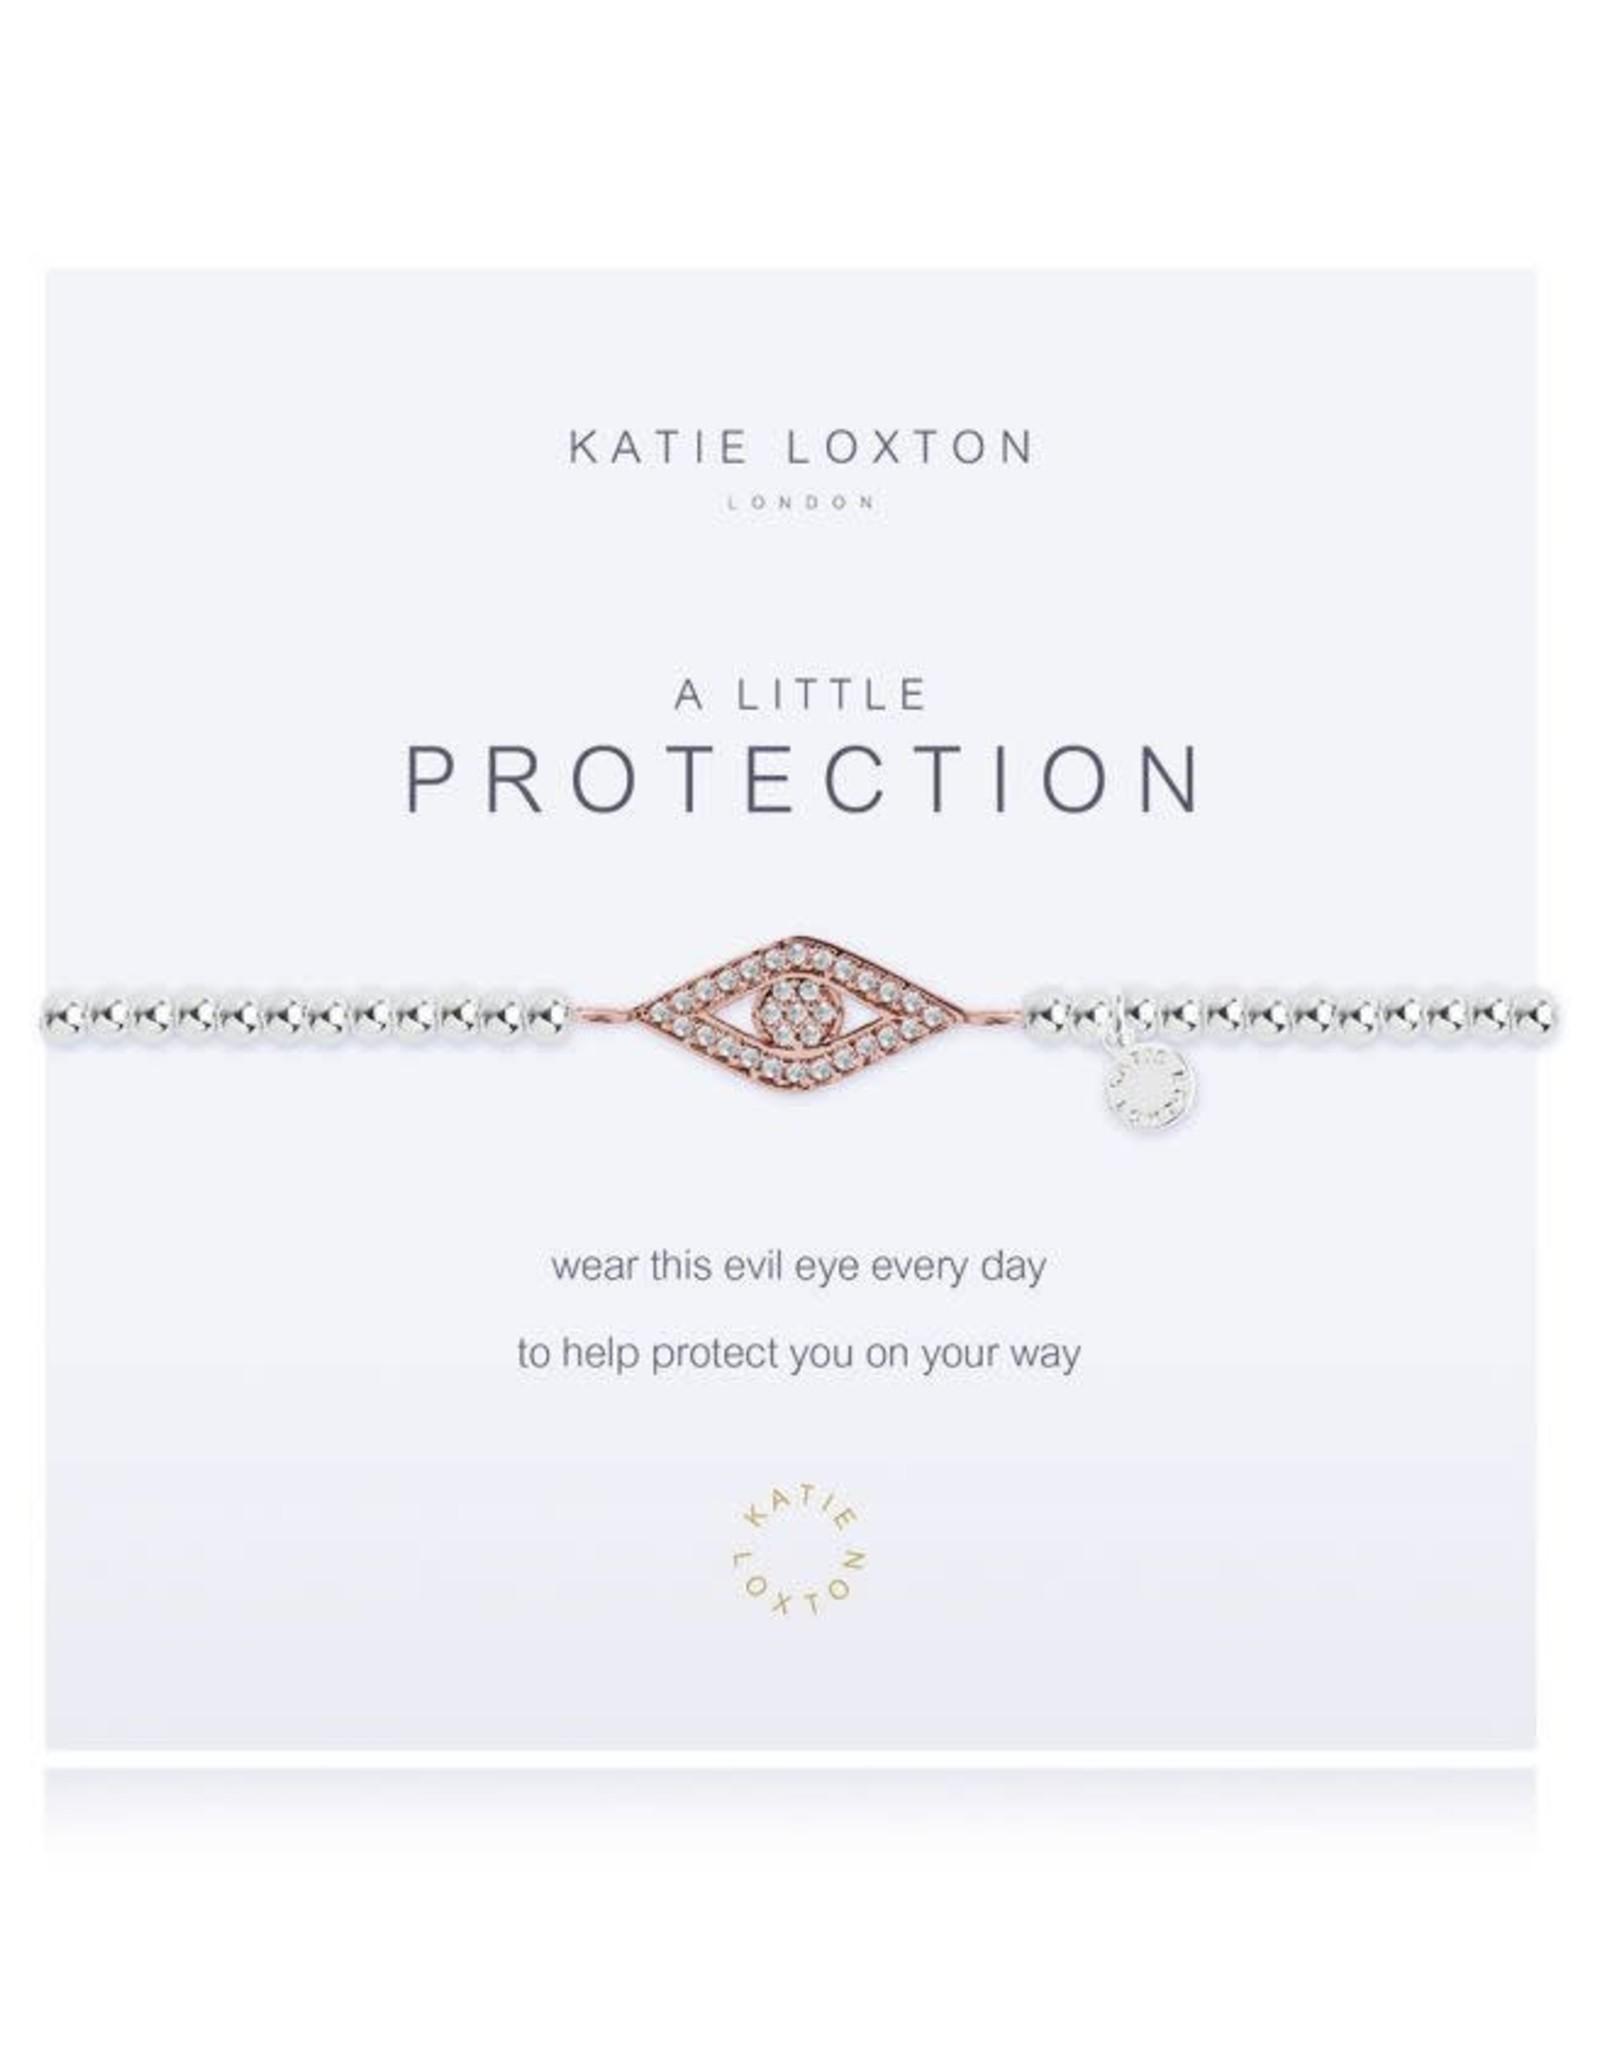 Katie Loxton Bracelet-Protection